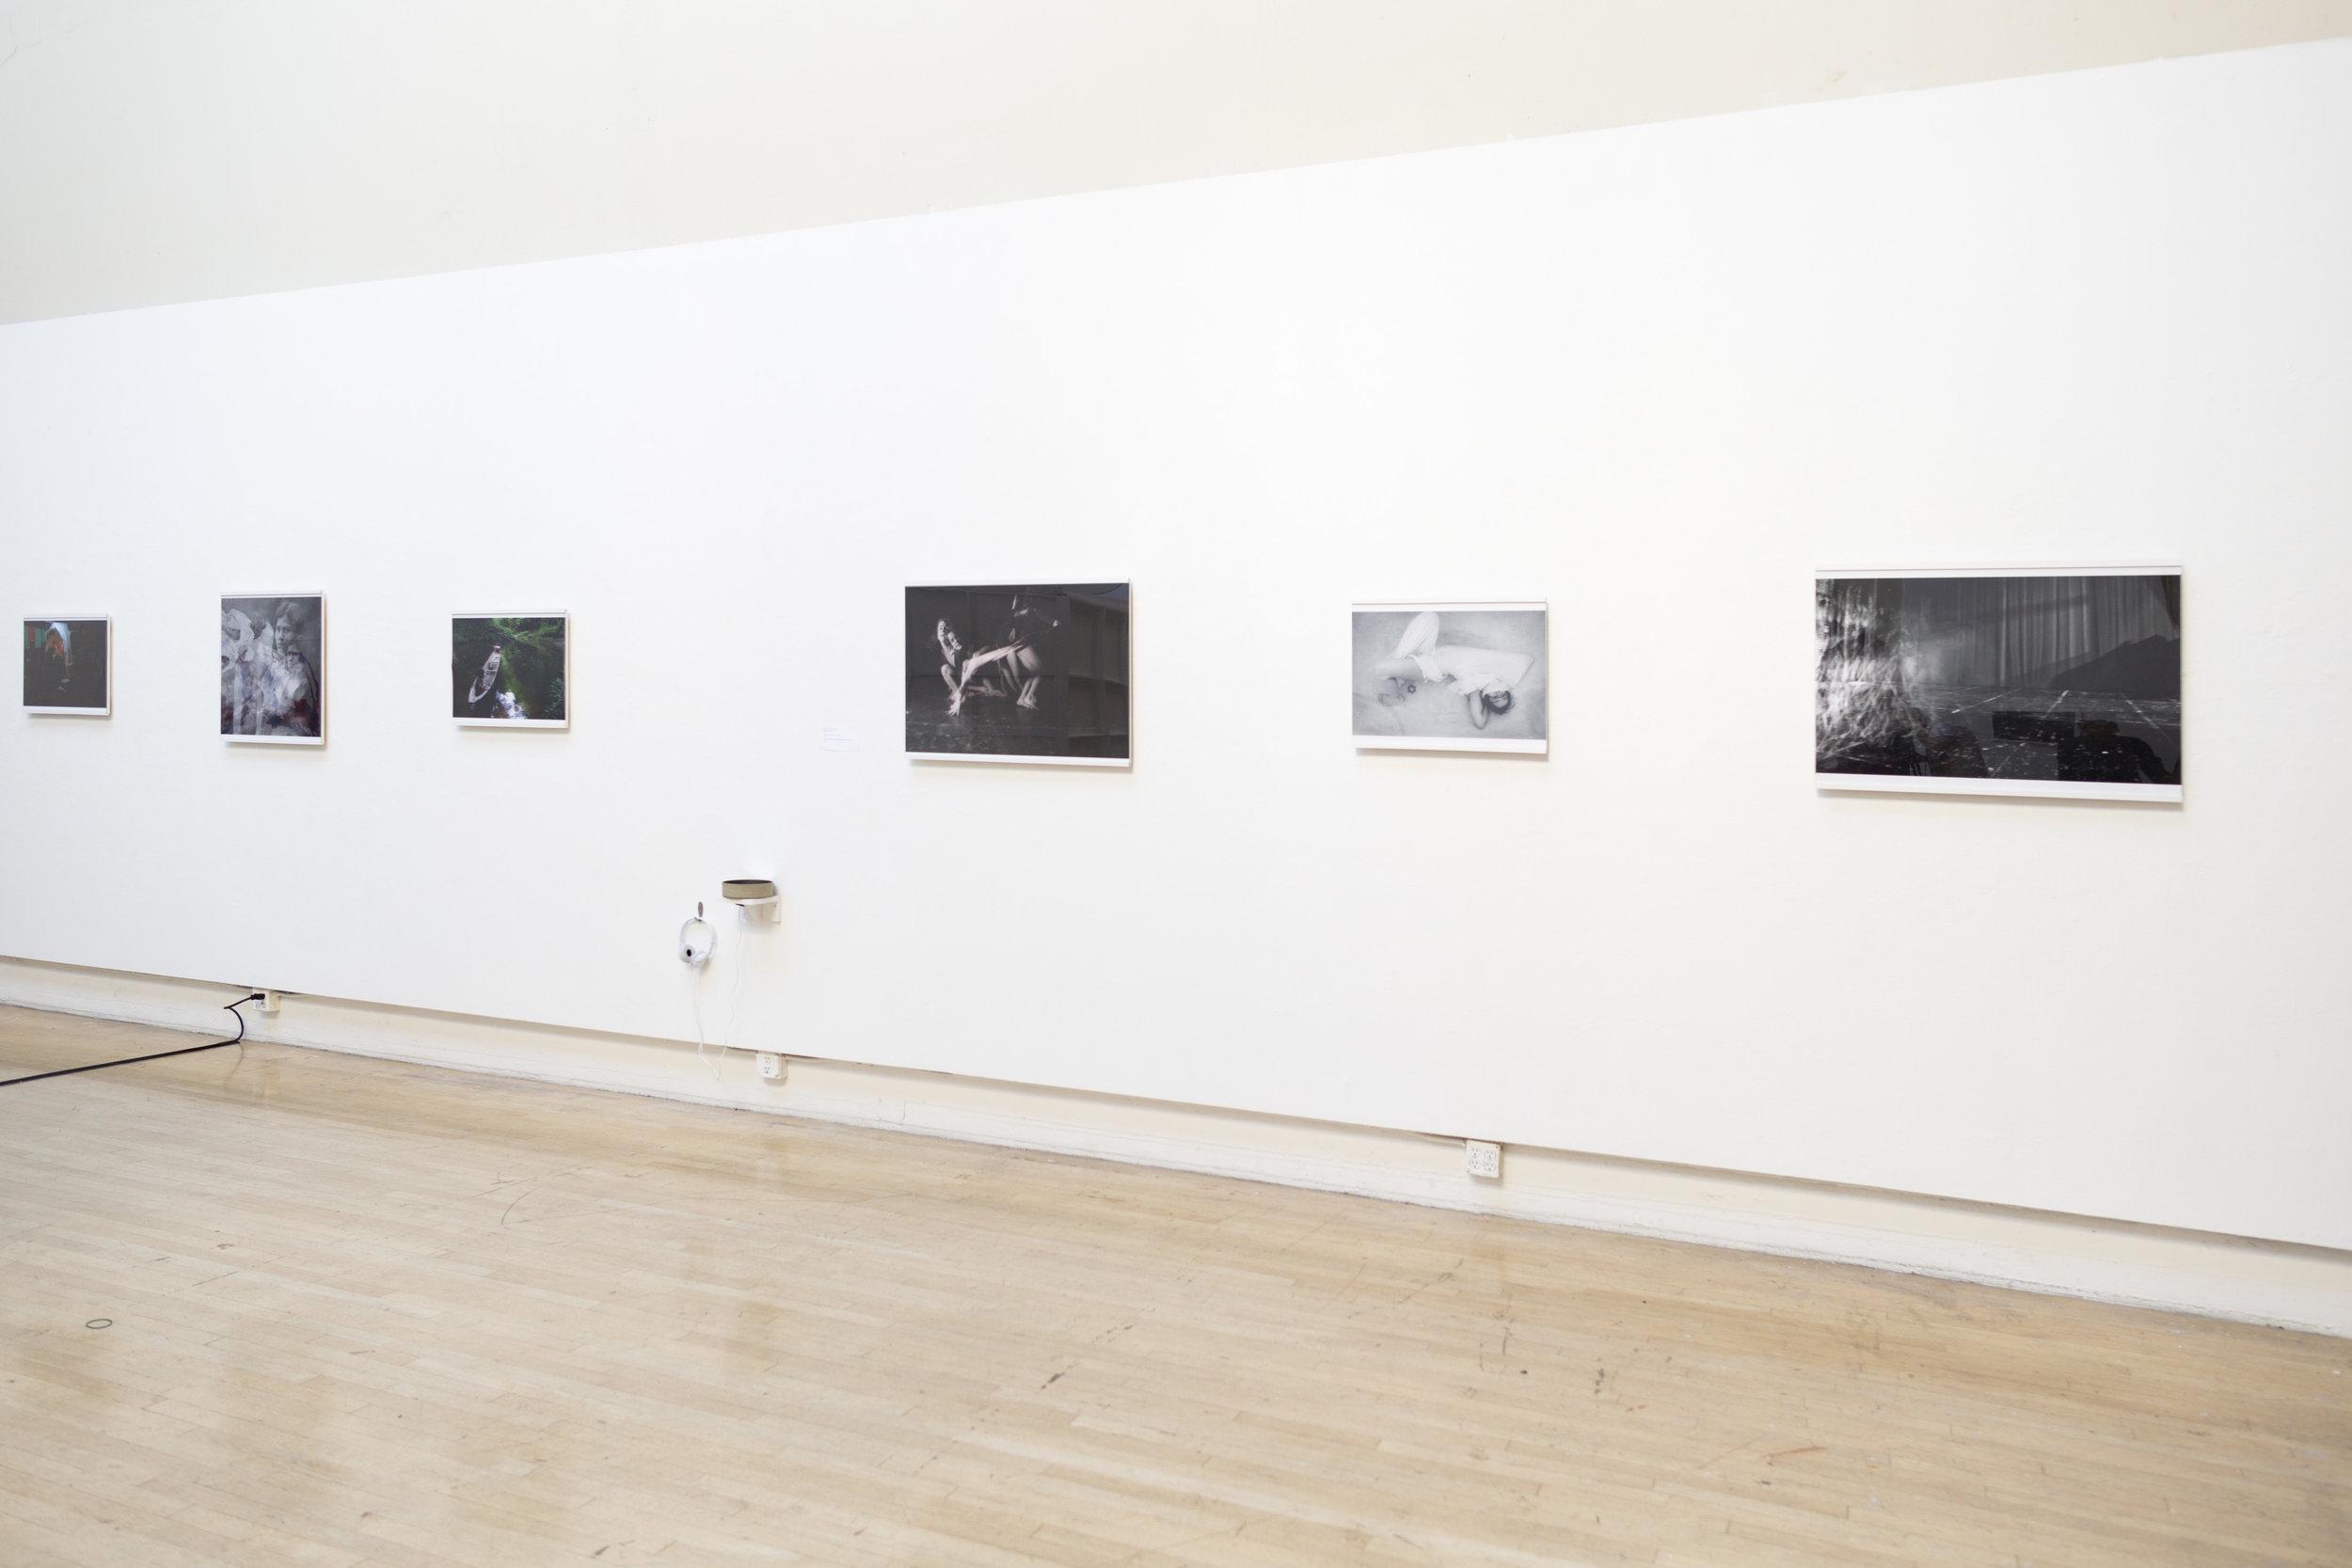 Photographs and sound installation by Vivian Vivas